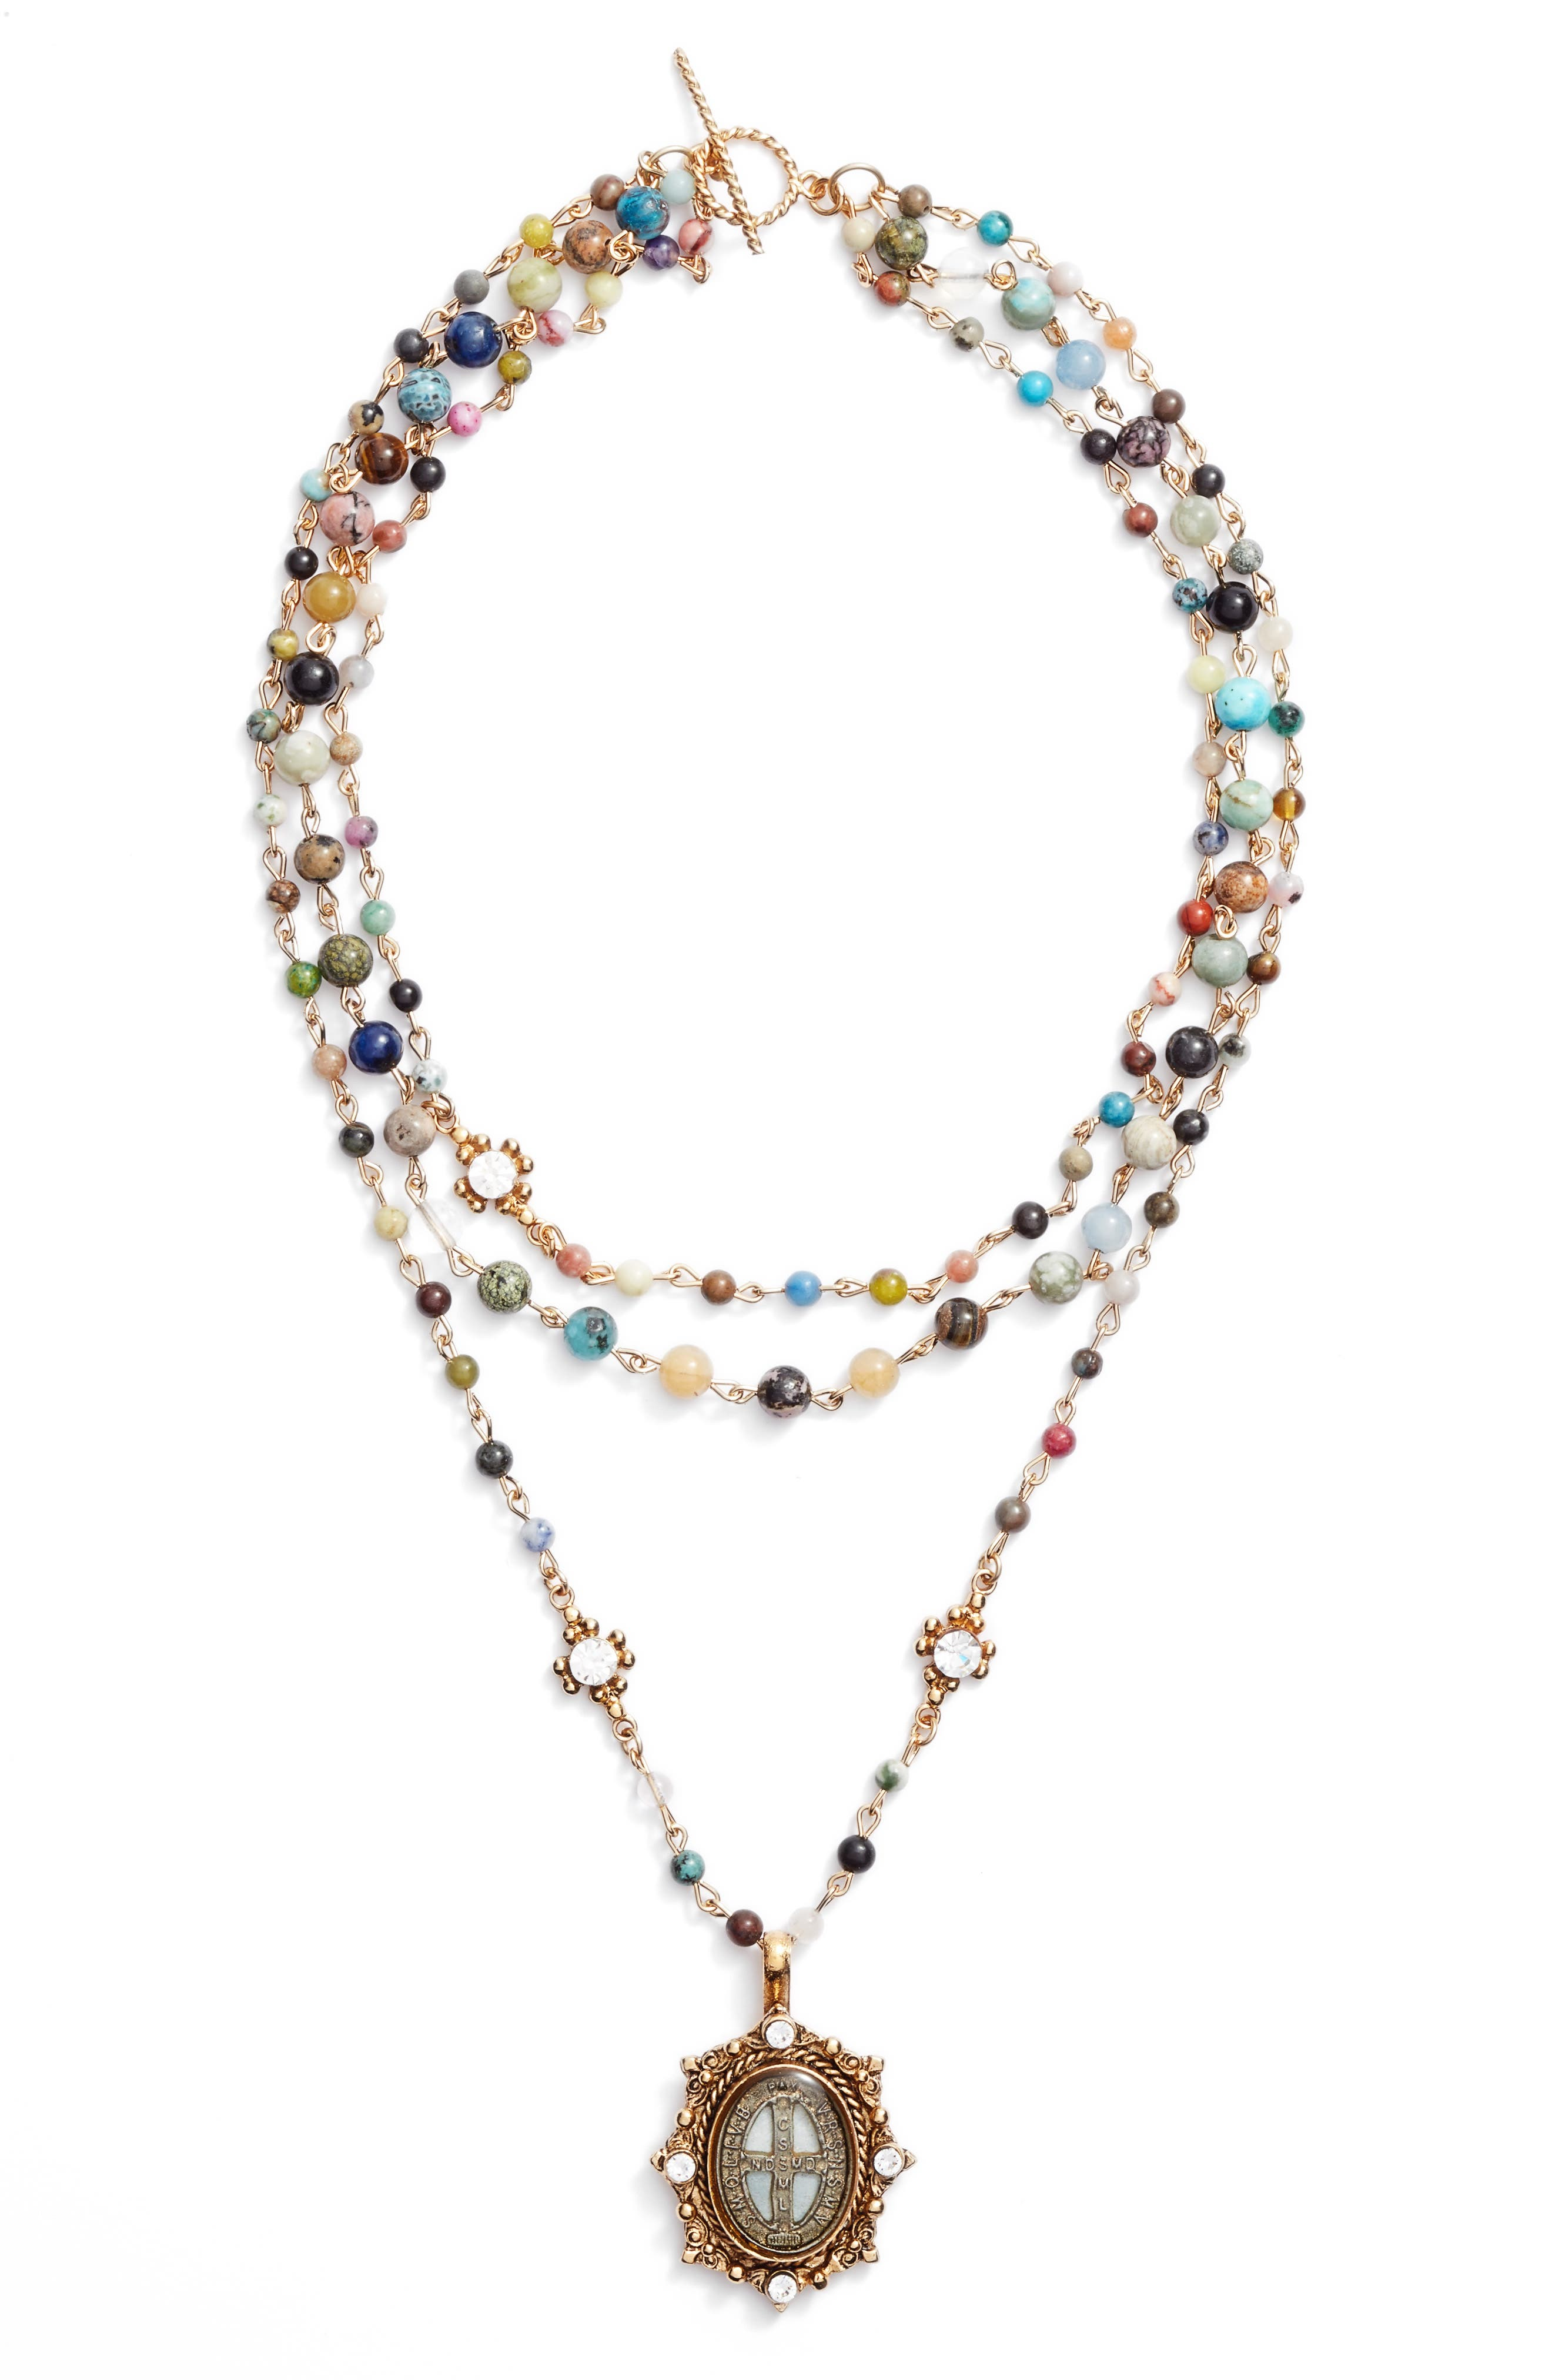 Magdalena Multistrand Necklace,                             Main thumbnail 1, color,                             Gold/ Mixed Quartz